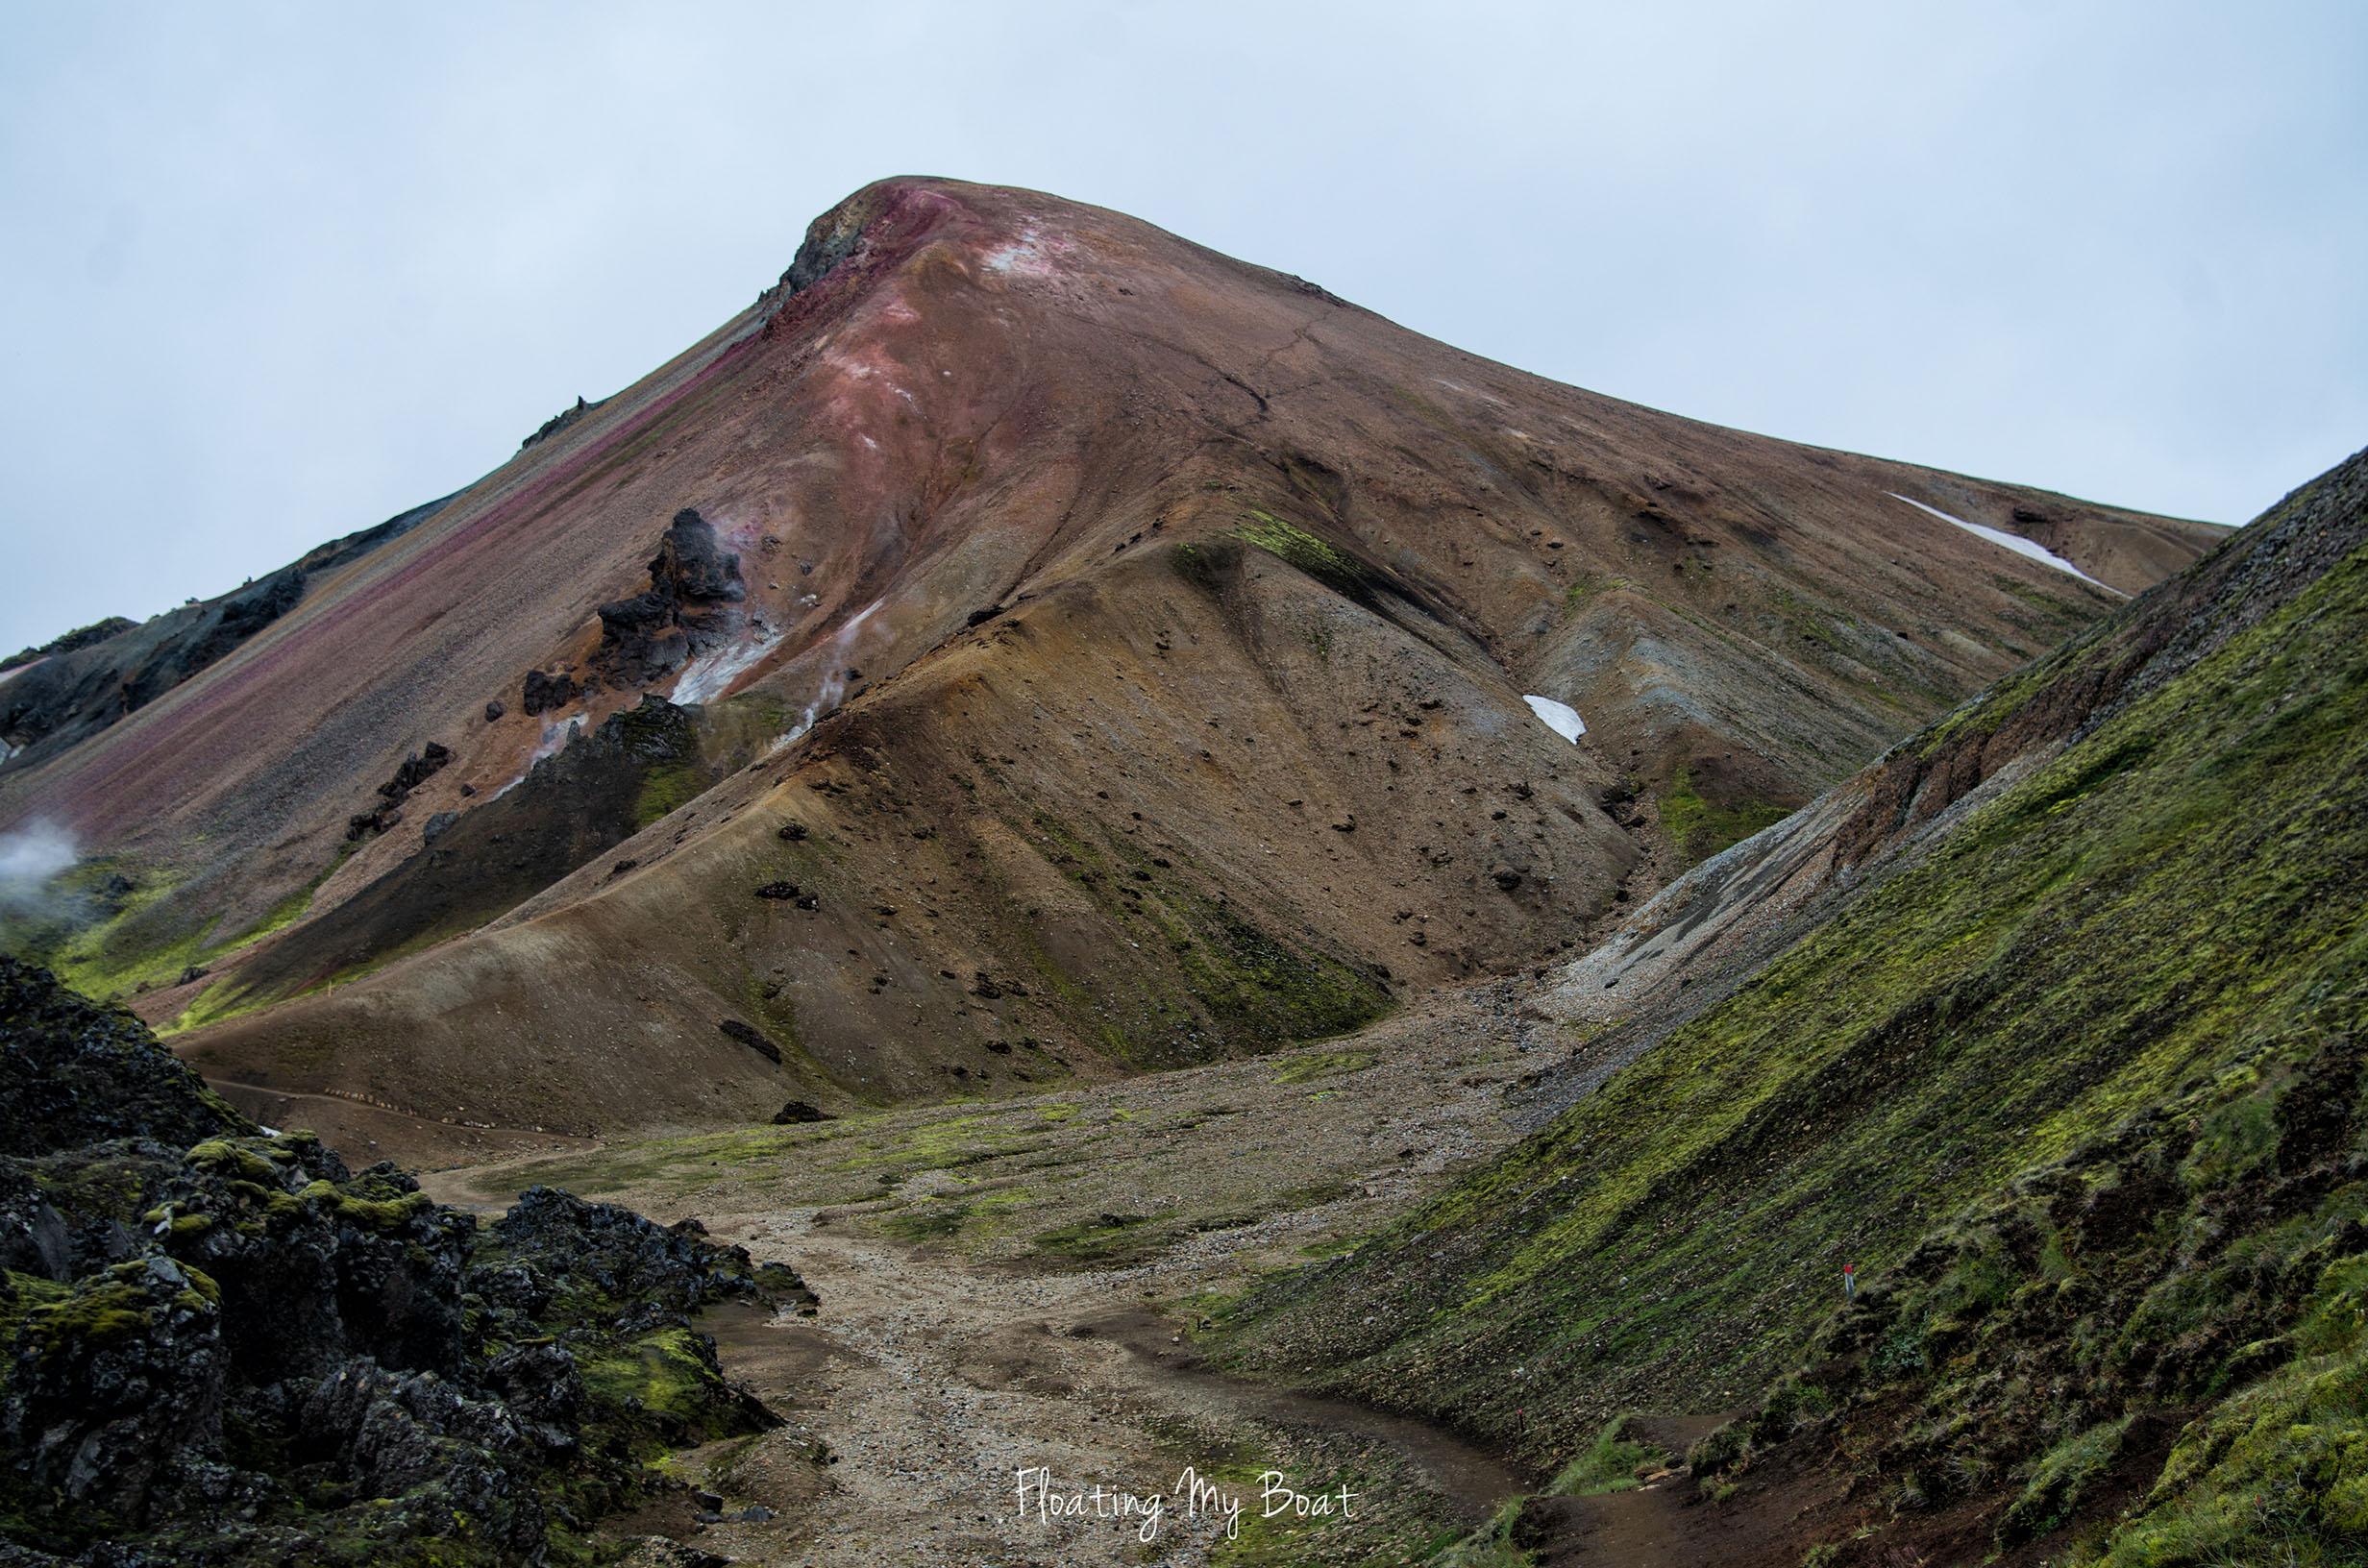 Hiking-Brennisteinsalda-volcano-Landmannalaugar-iceland